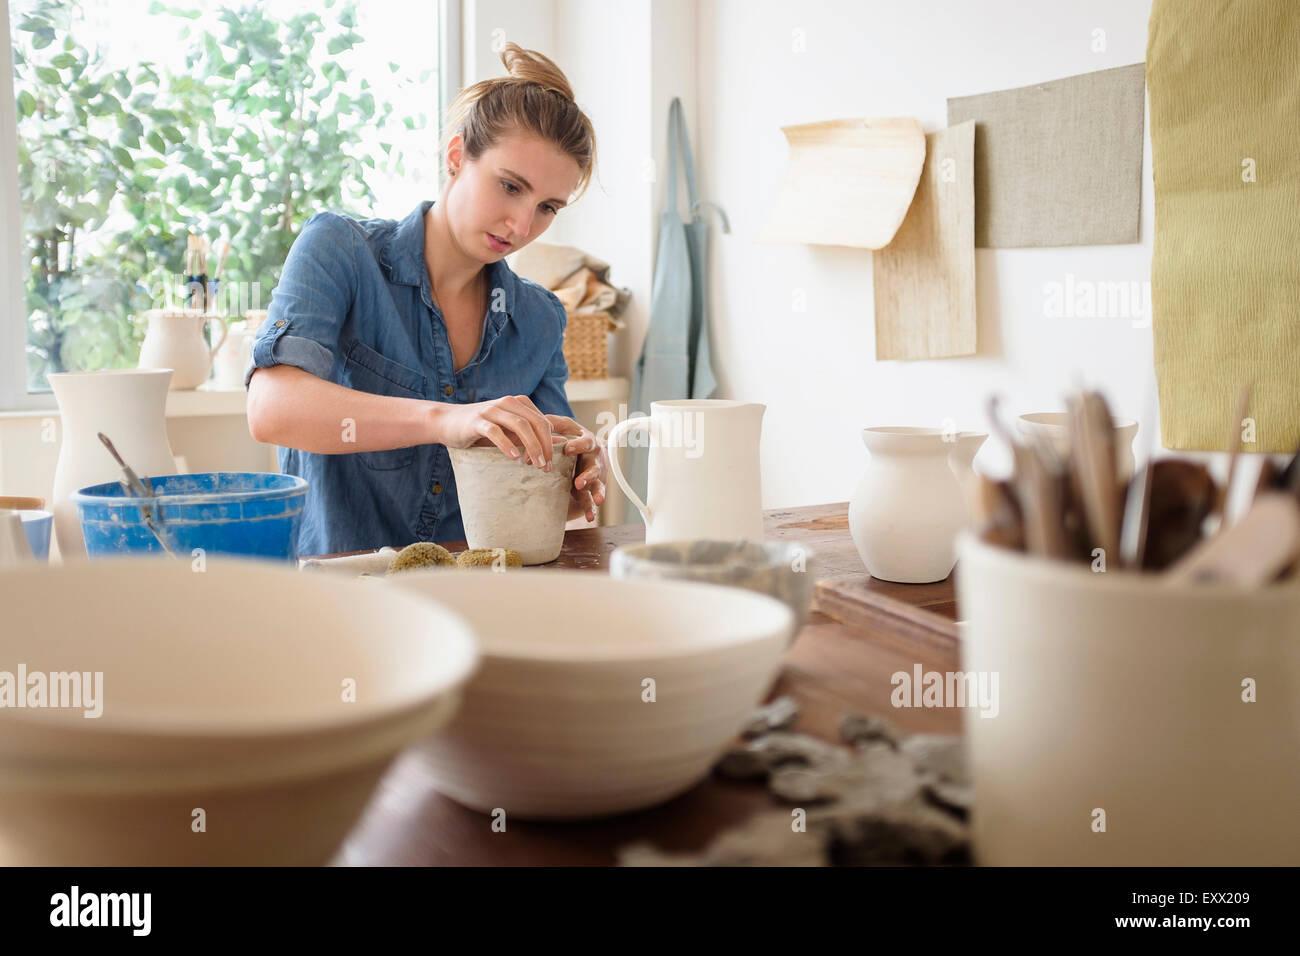 Jeune femme la poterie en studio Photo Stock